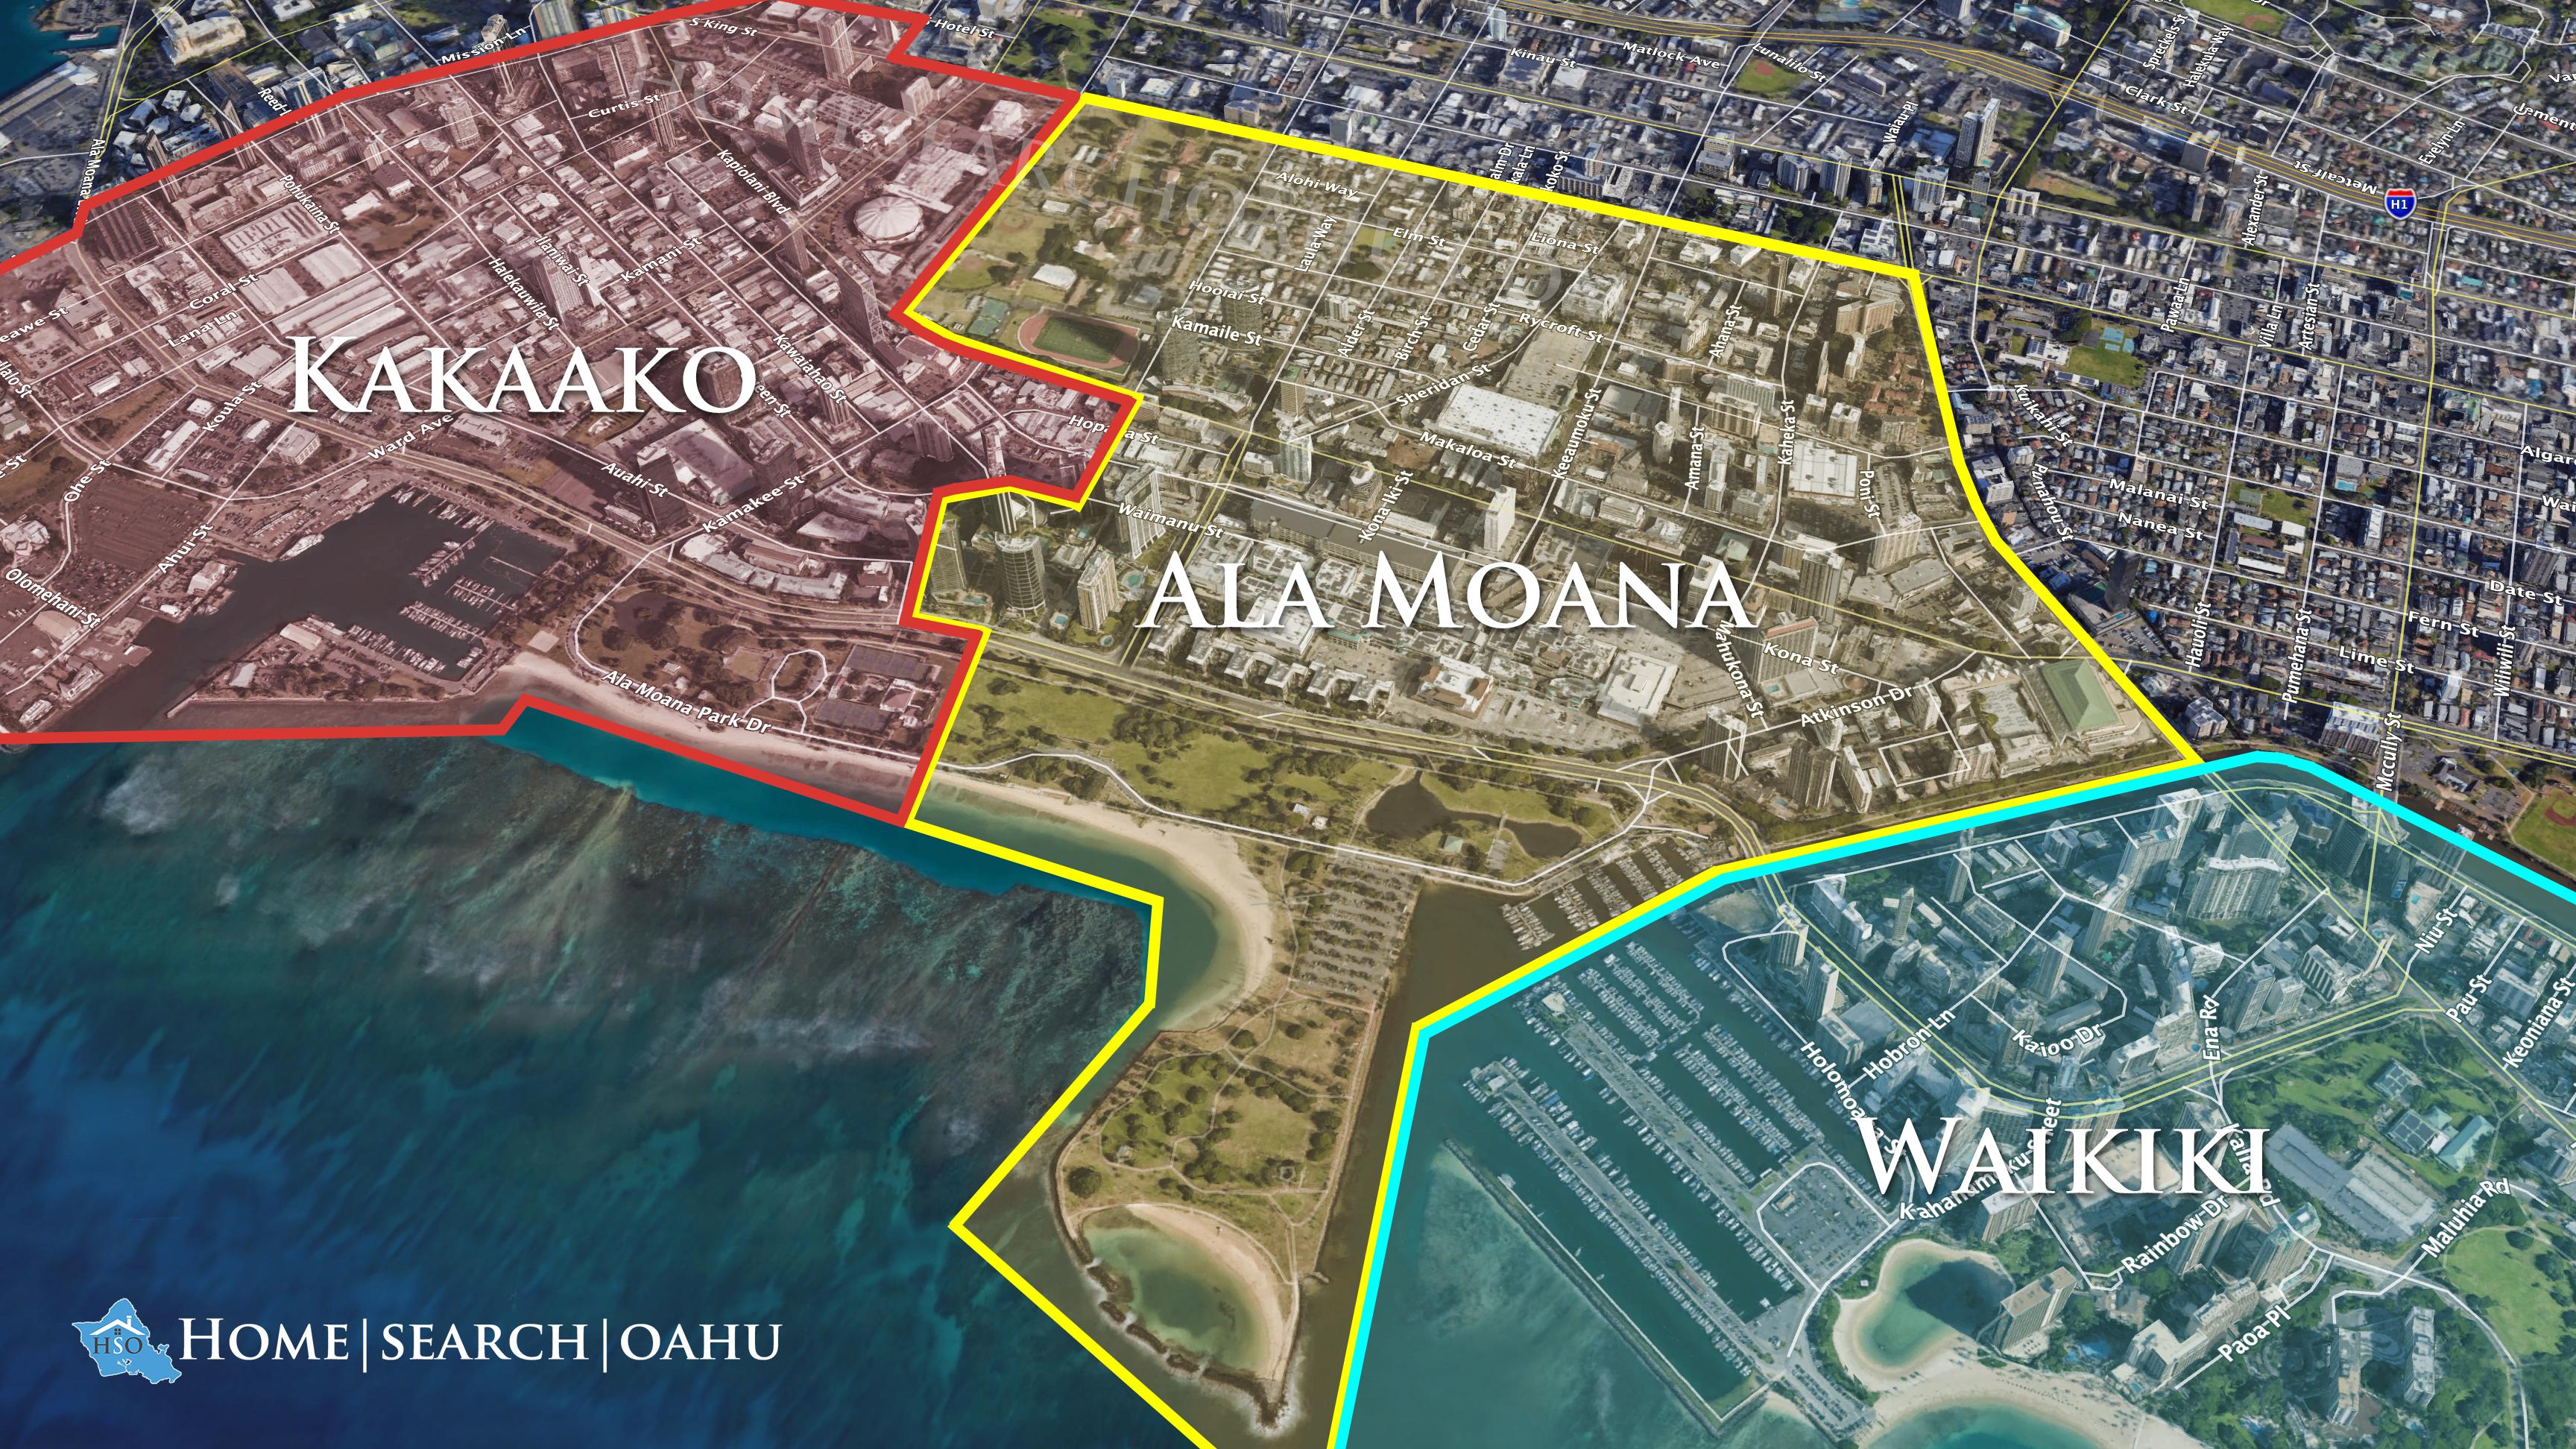 Kakaako, Ala Moana, and Waikiki Neighborhood